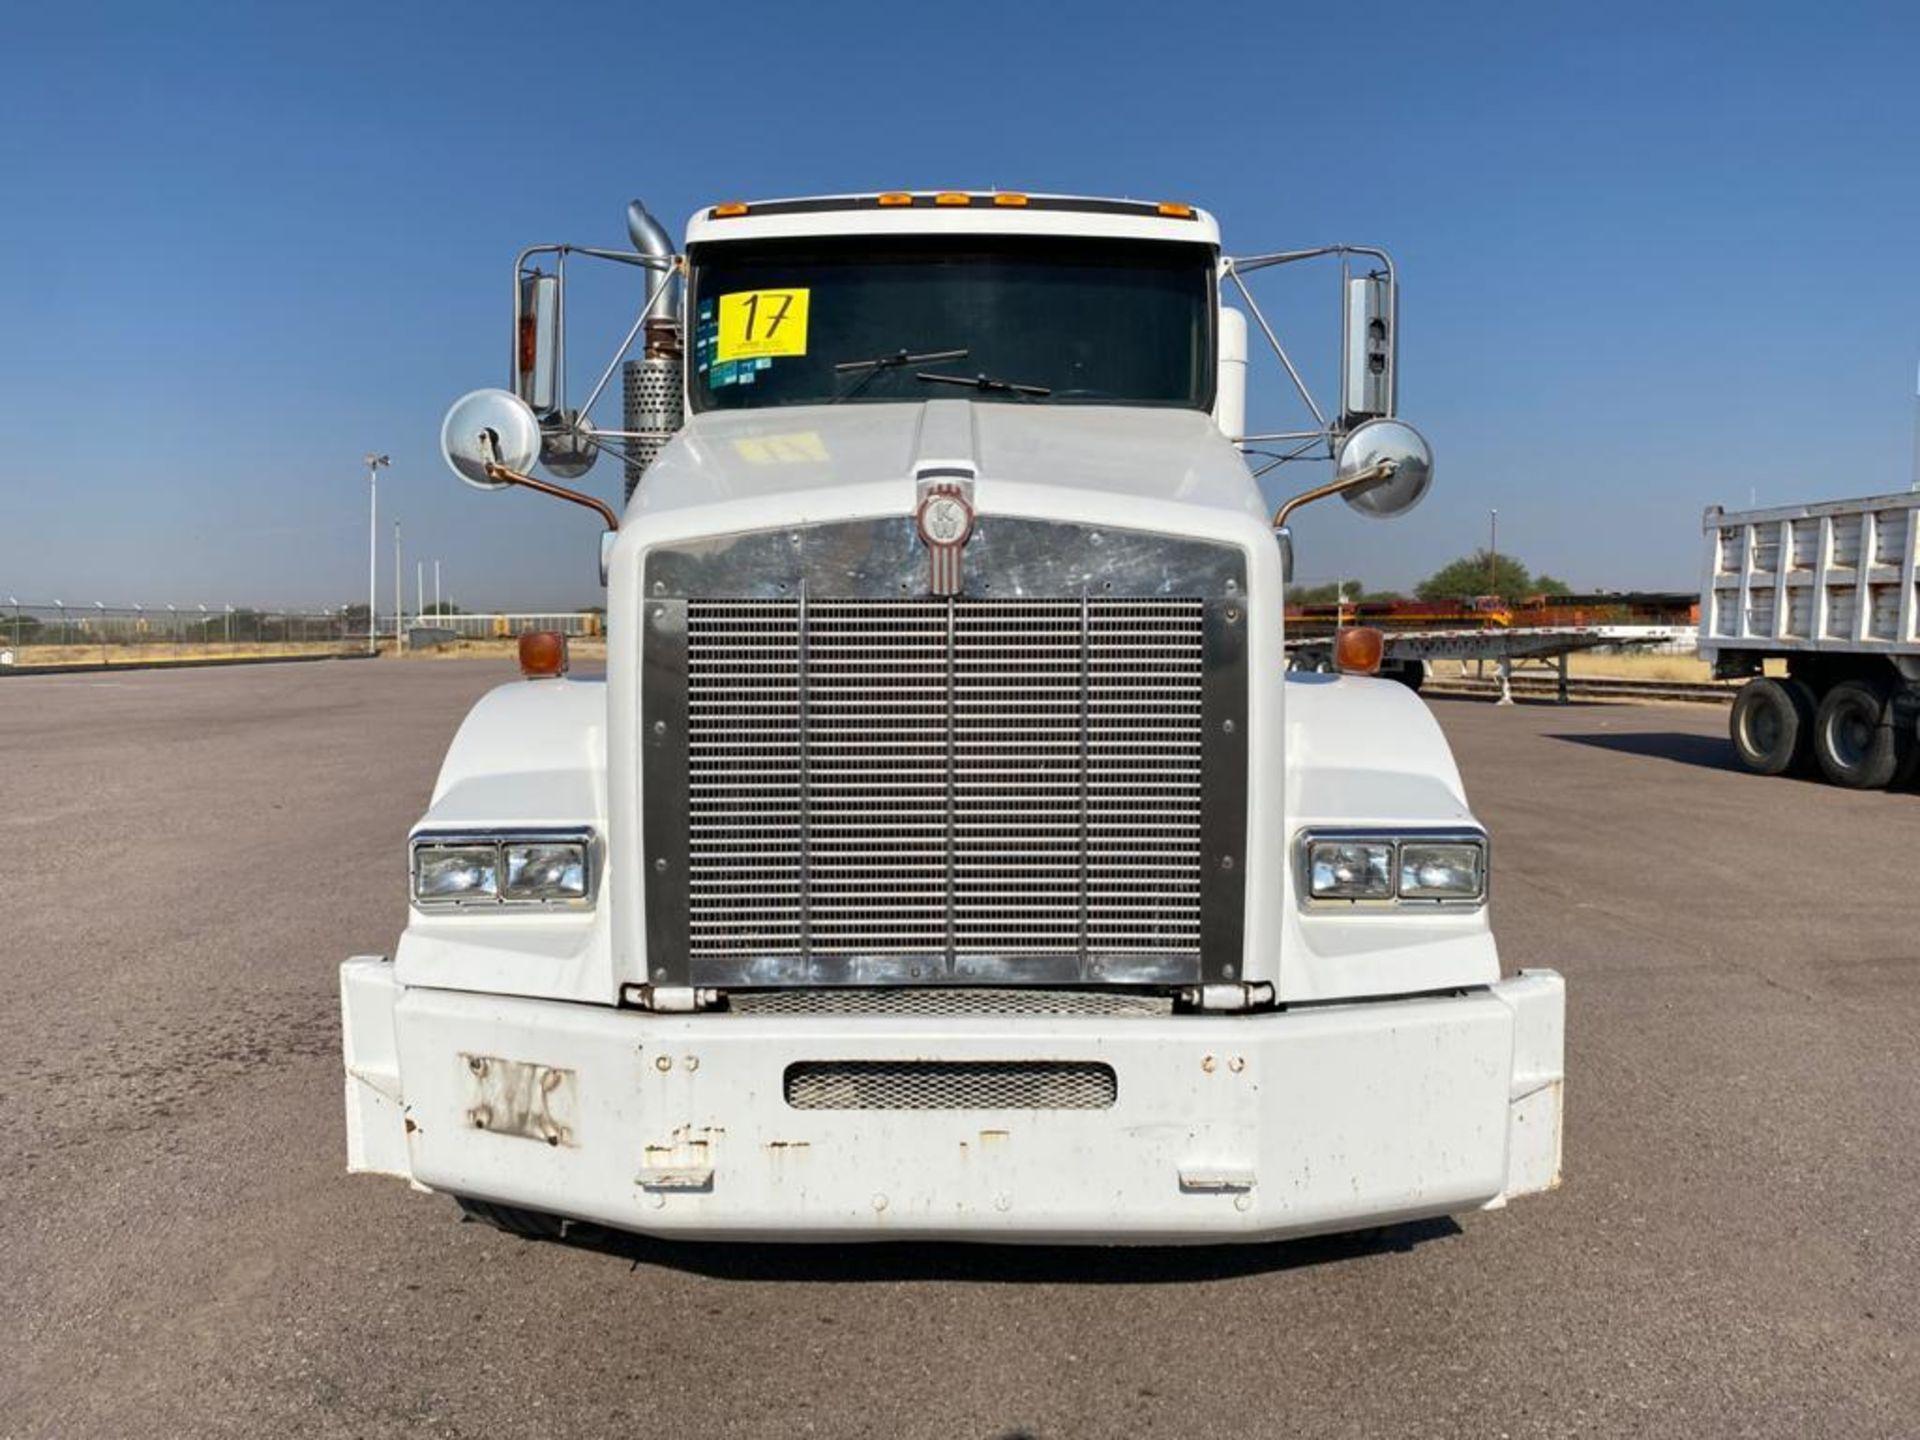 1998 Kenworth Sleeper Truck Tractor, standard transmission of 18 speeds - Image 4 of 55